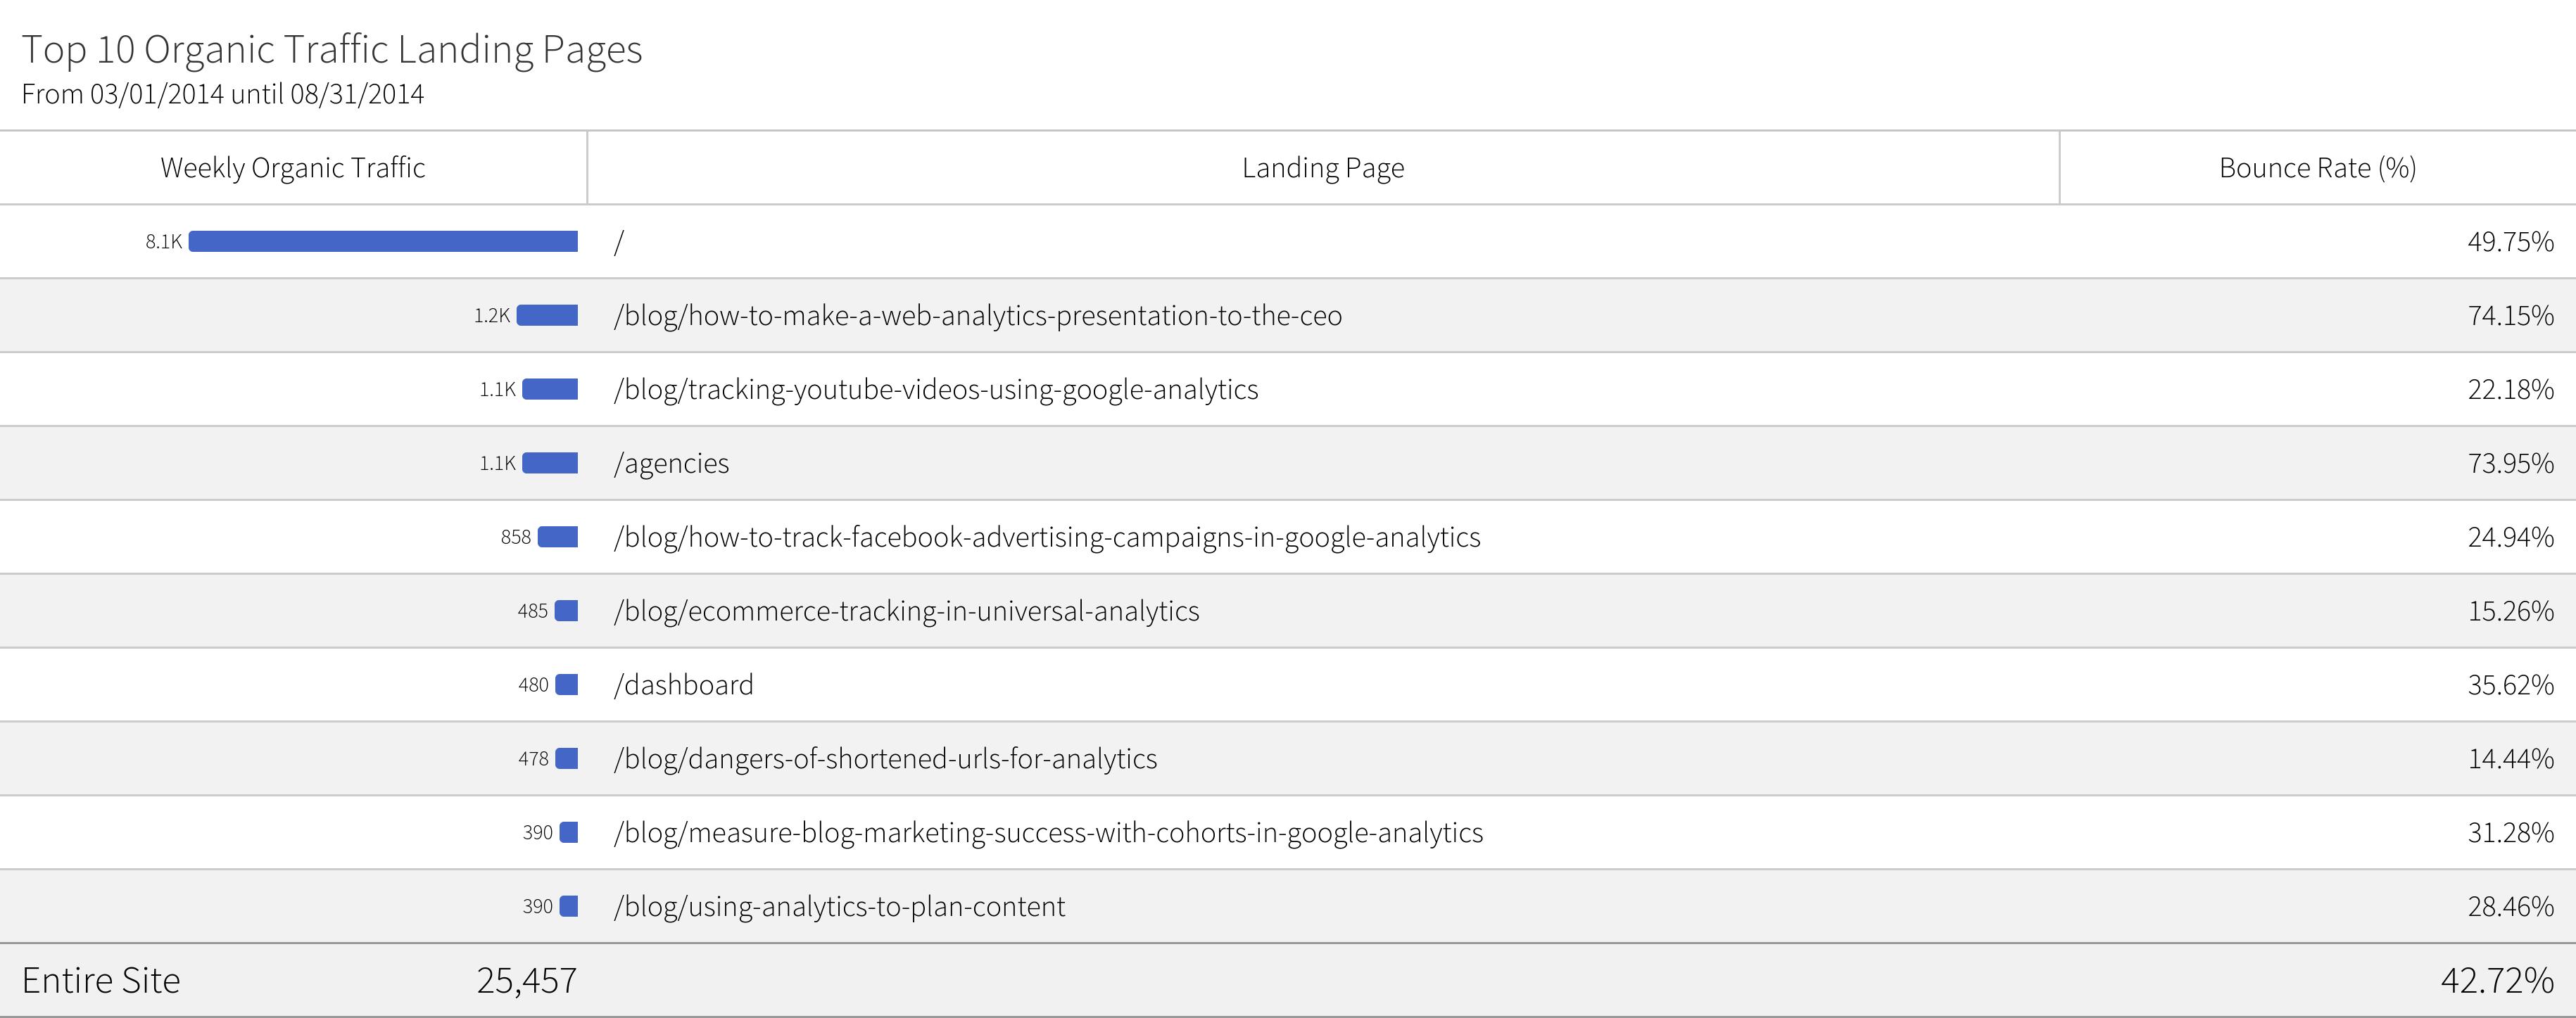 megalytic widget showing top 10 organic landing pages